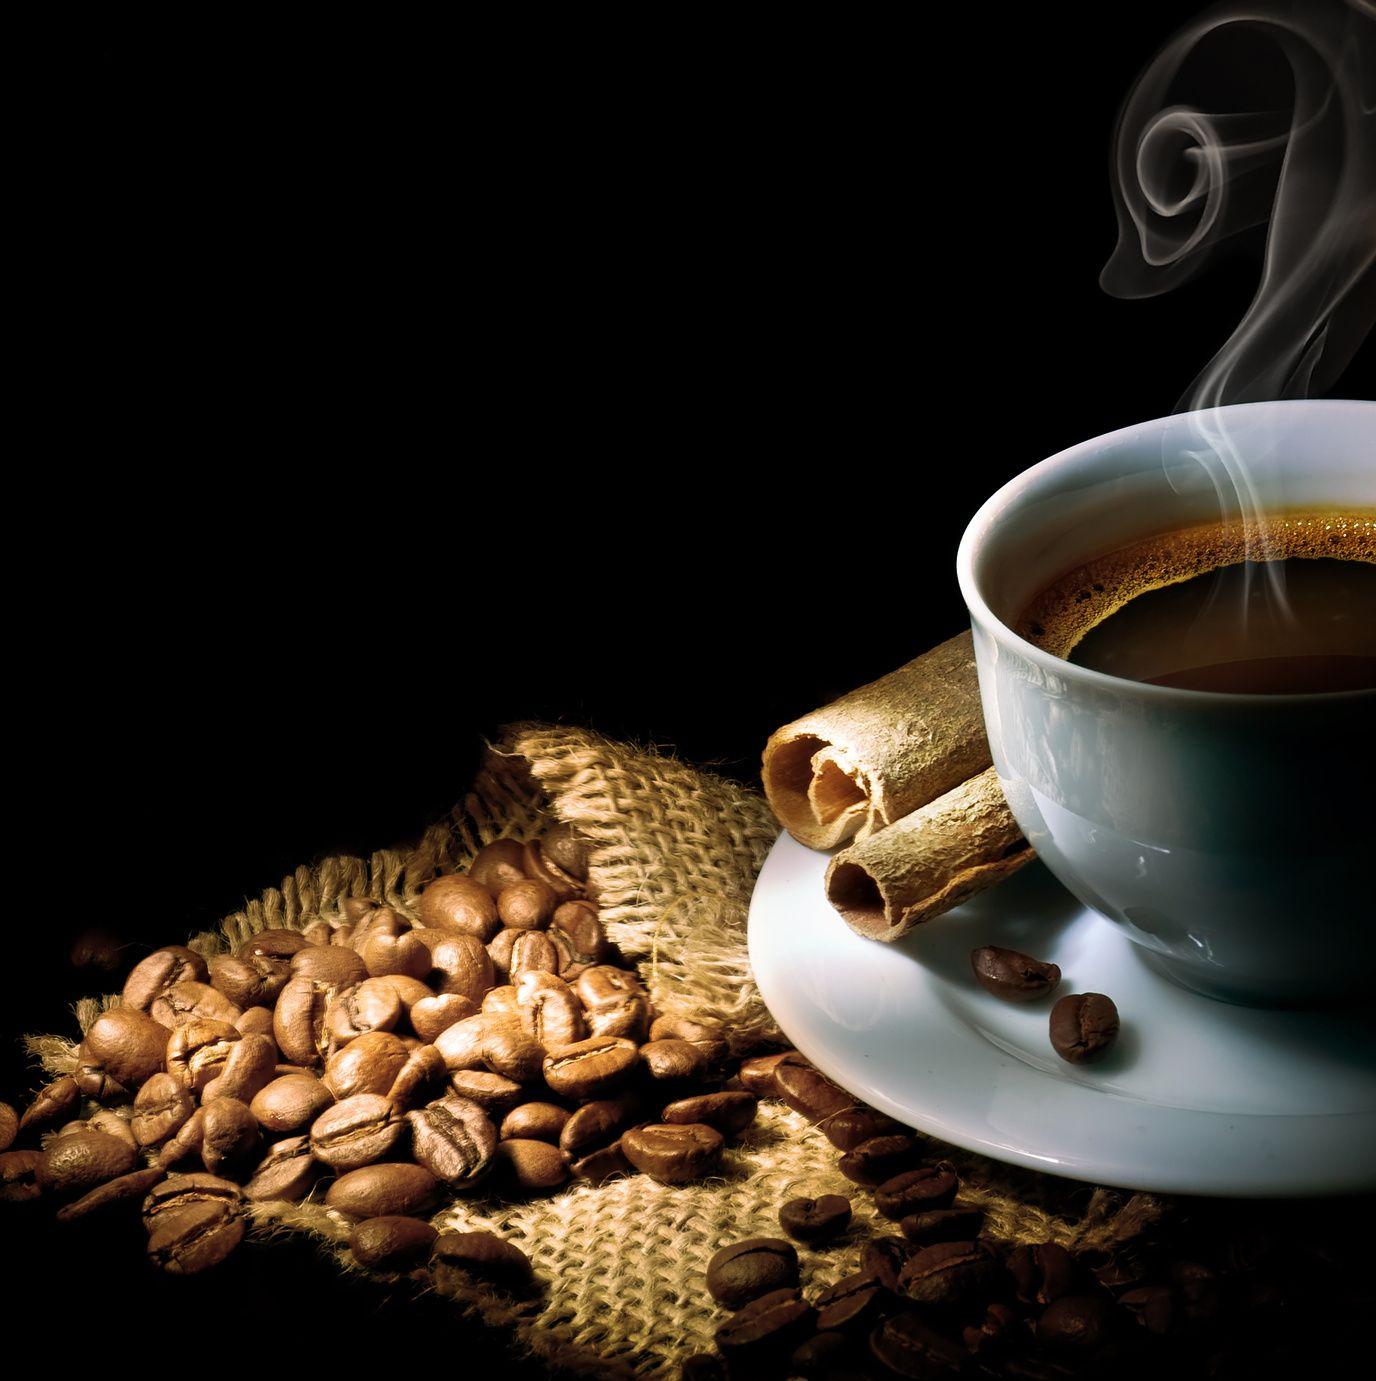 Pin By ~ JoAnna Wilsdorf ~ On Coffee !!